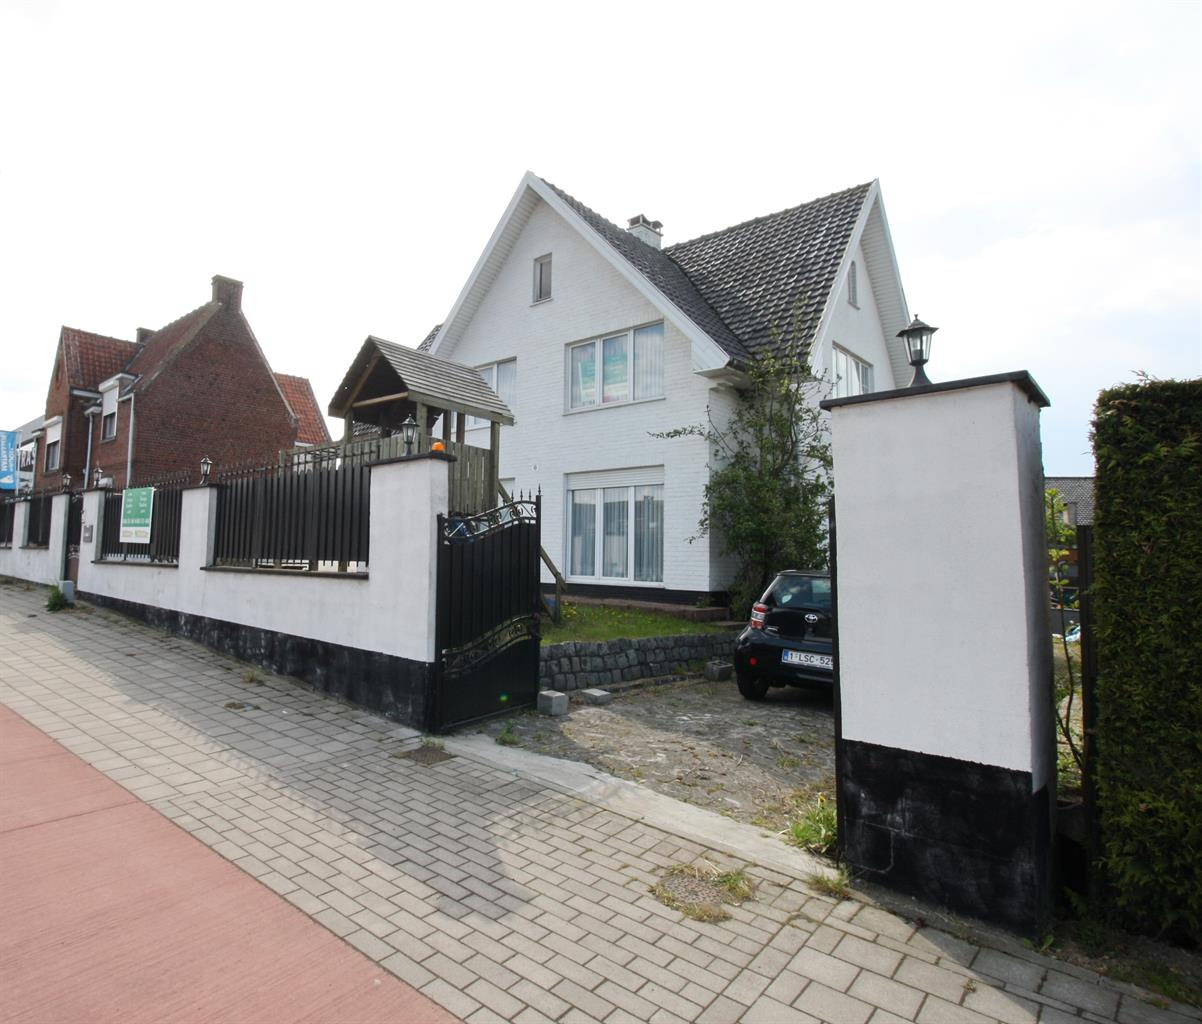 Maison - Roosdaal - #4363070-0